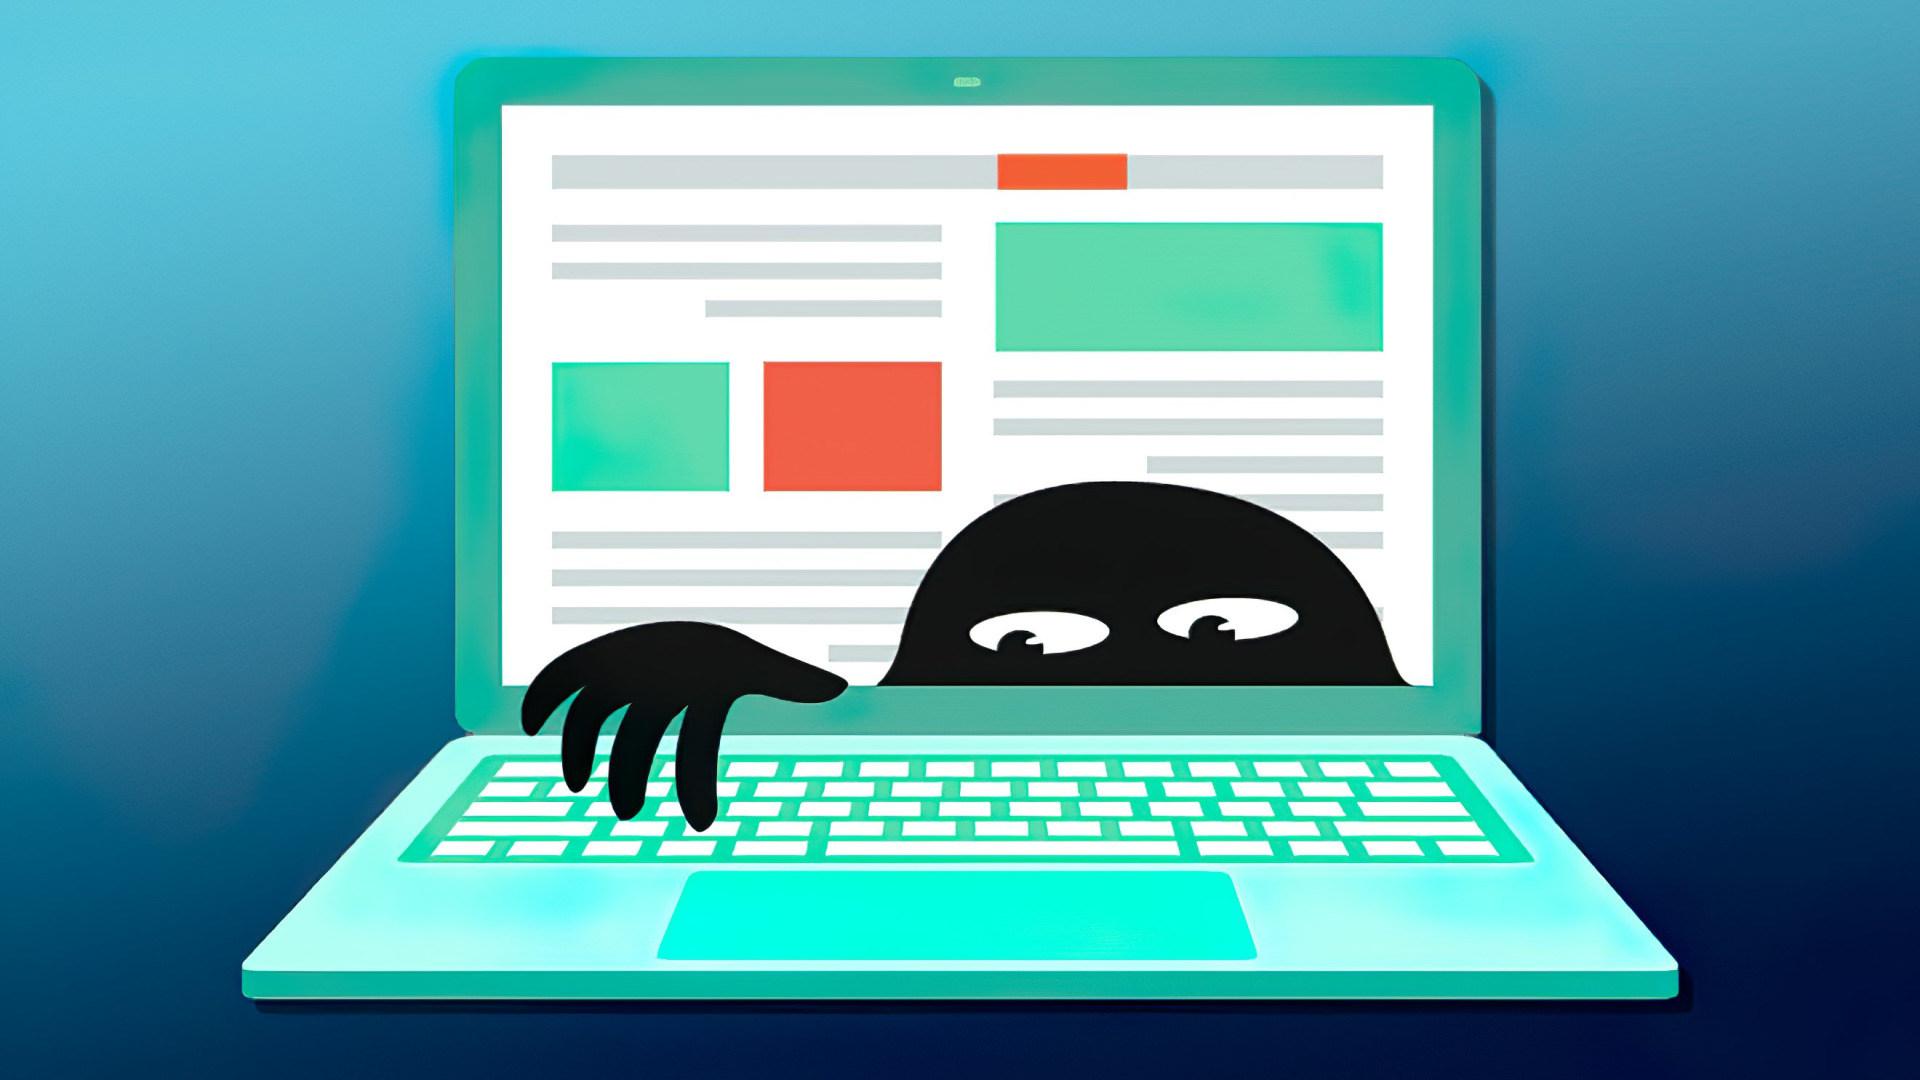 Sicherheit, Sicherheitslücke, Leak, Hacker, Malware, Security, Hack, Angriff, Bug, Trojaner, Virus, Kriminalität, Schadsoftware, Exploit, Cybercrime, Hacking, Cybersecurity, Spam, Hackerangriff, Ransomware, Phishing, Internetkriminalität, Erpressung, Ddos, Warnung, Hacken, Darknet, Hacker Angriffe, Hacker Angriff, Ransom, Attack, Hacks, Viren, Gehackt, Schädling, China Hacker, Adware, Russische Hacker, Error, Security Report, Crime, Malware Warnung, Security Bulletin, Promi-Hacker, Android Malware, Phisher, Secure, Breaking